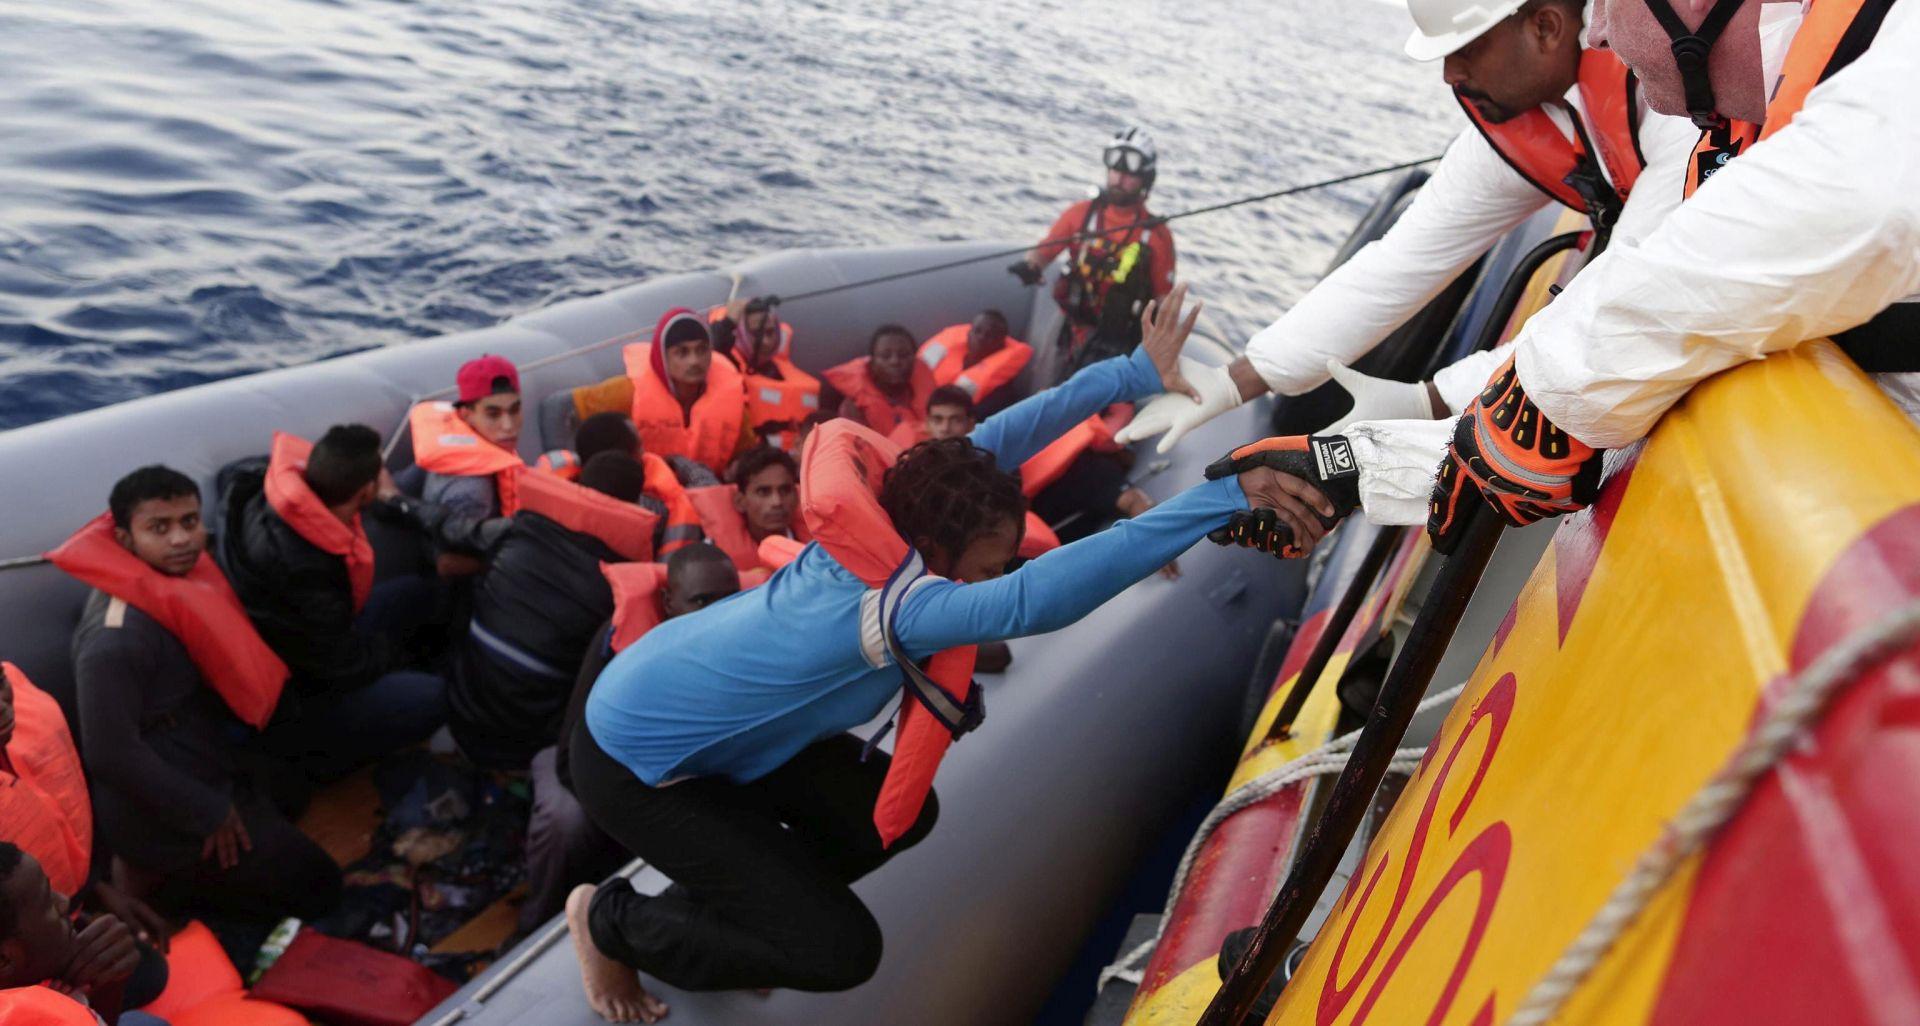 Gliser s oznakom libijske Obalne straže napao migrantski brod, najmanje 4 osobe se utopile